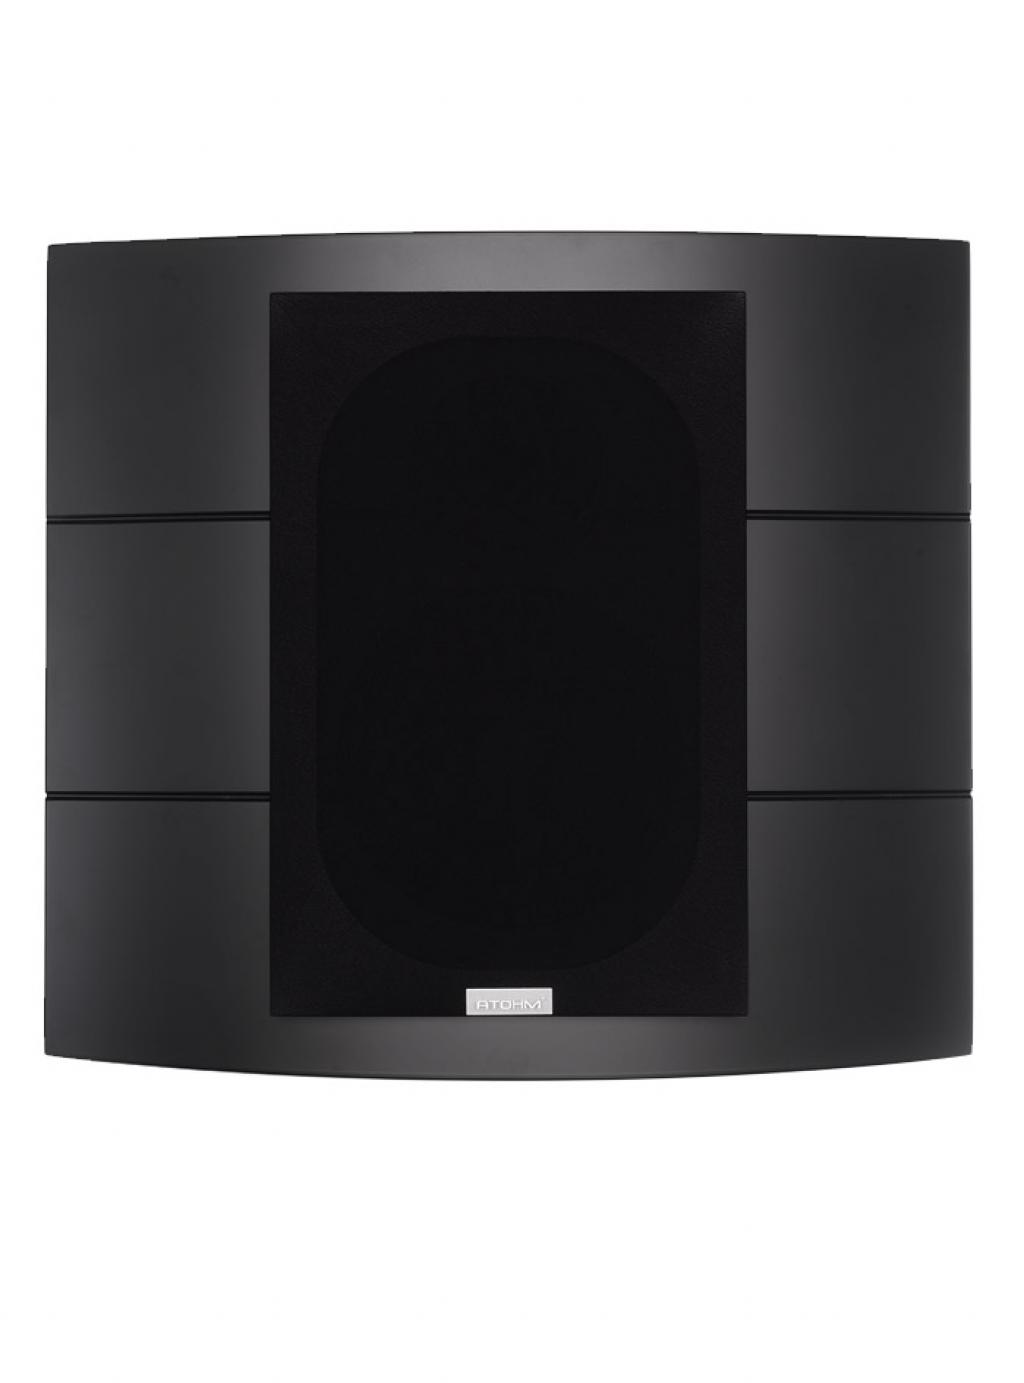 Boxe Atohm Furtive 2.0 Pro